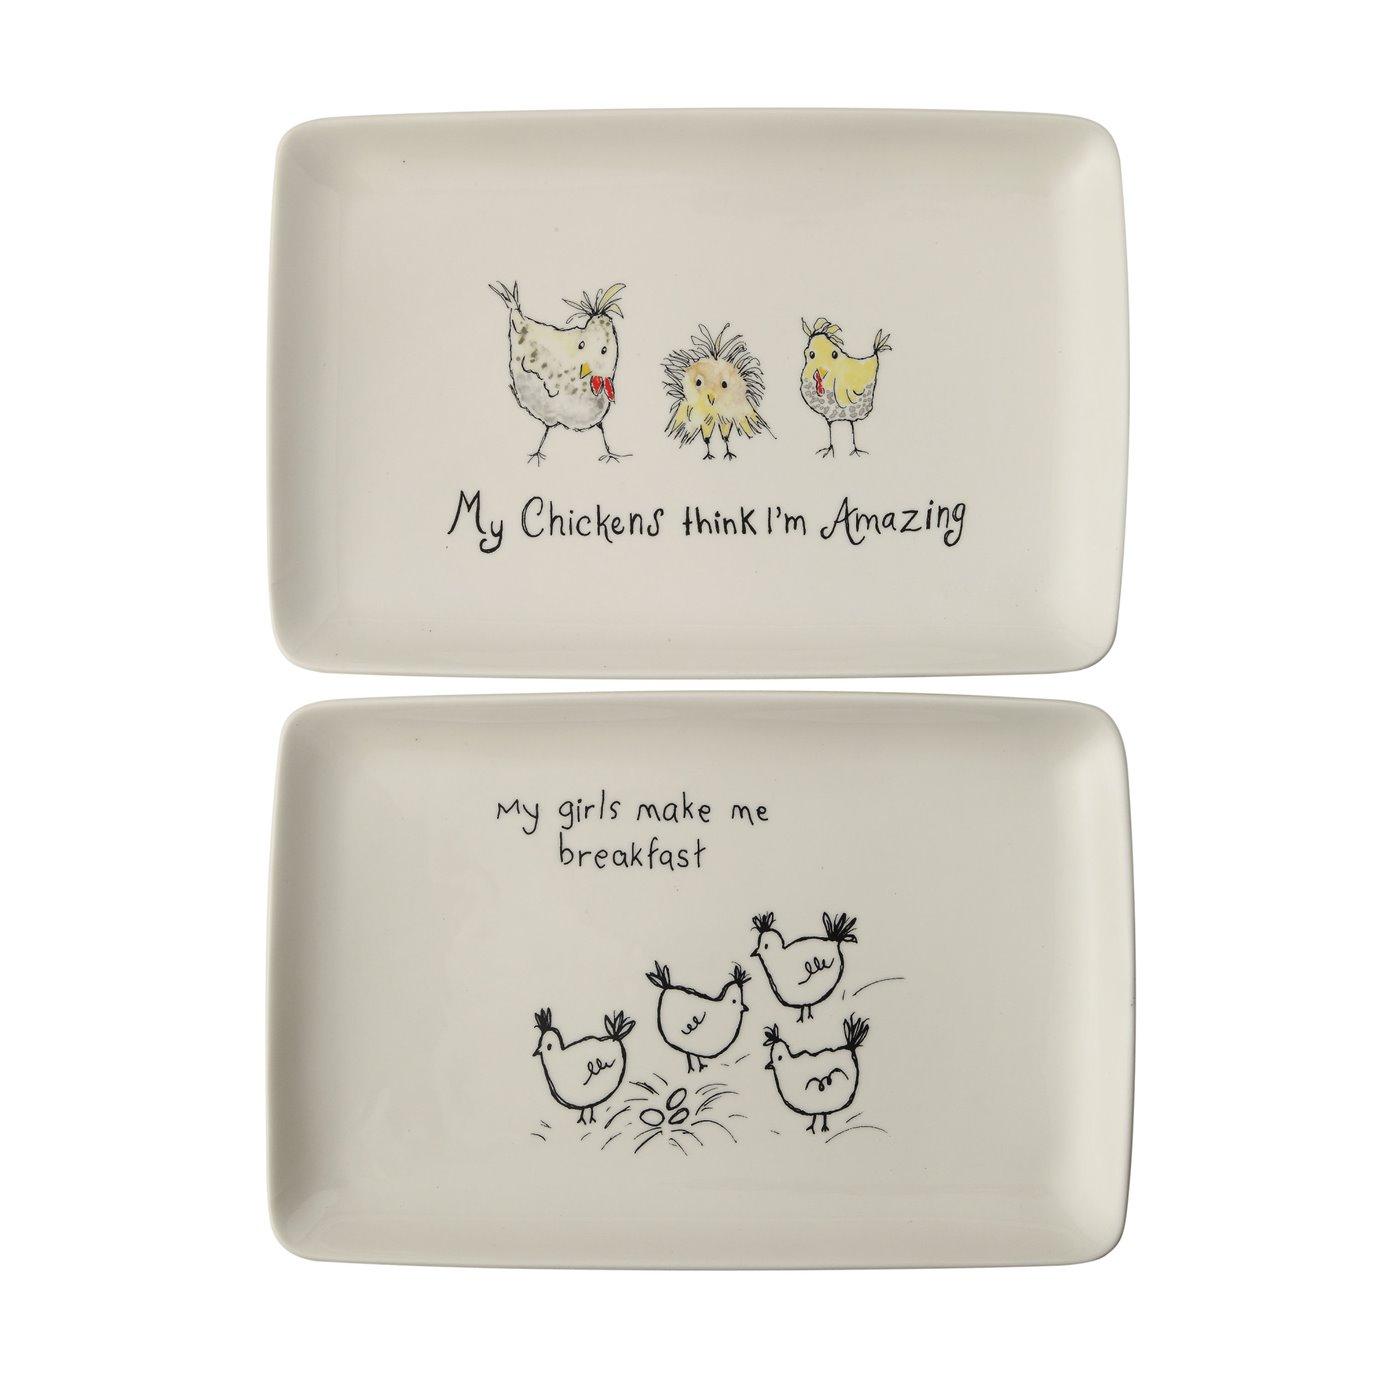 """My Chickens Think I'm Amazing"" Rectangle White Stoneware Platter (Set of 2 Designs)"